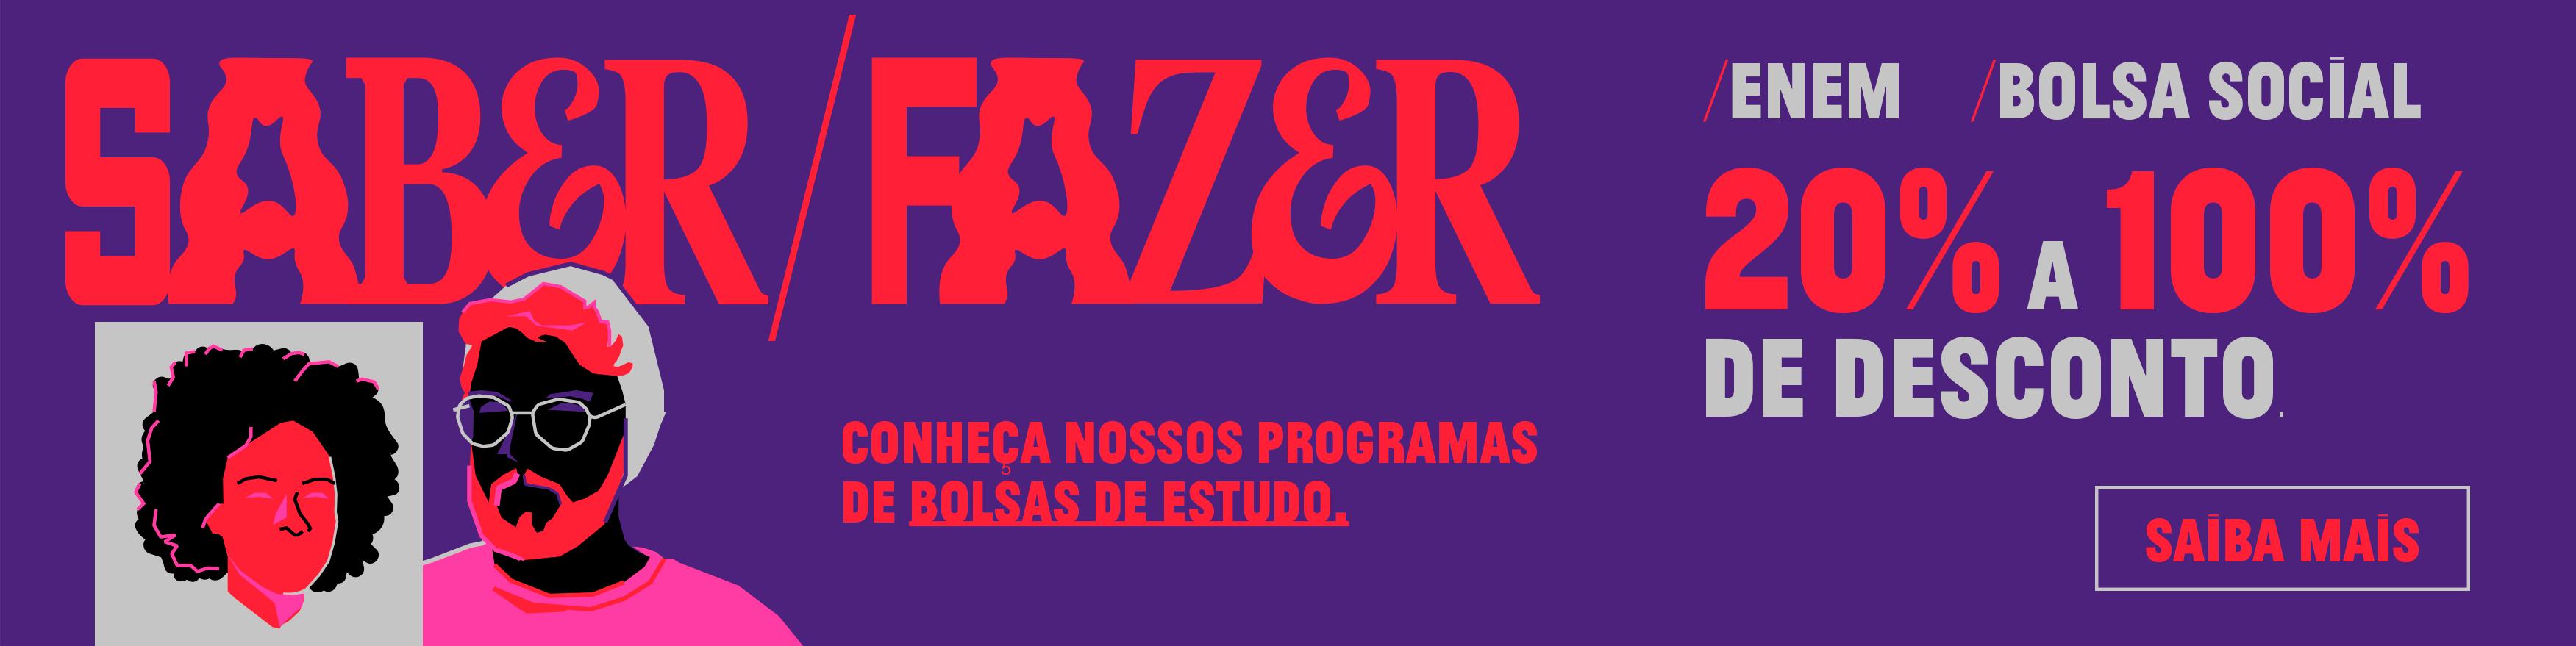 Banner-Bolsa-Social